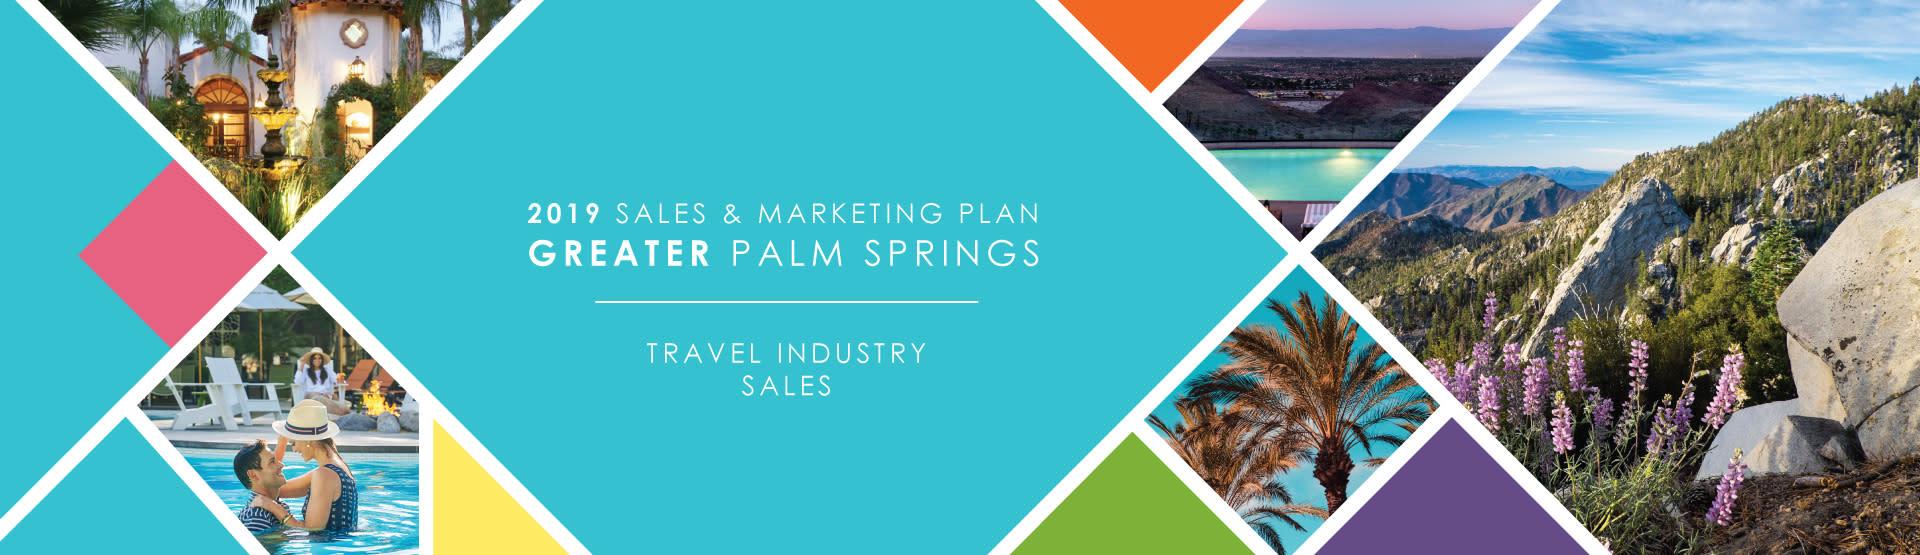 Travel Industry Sales Header